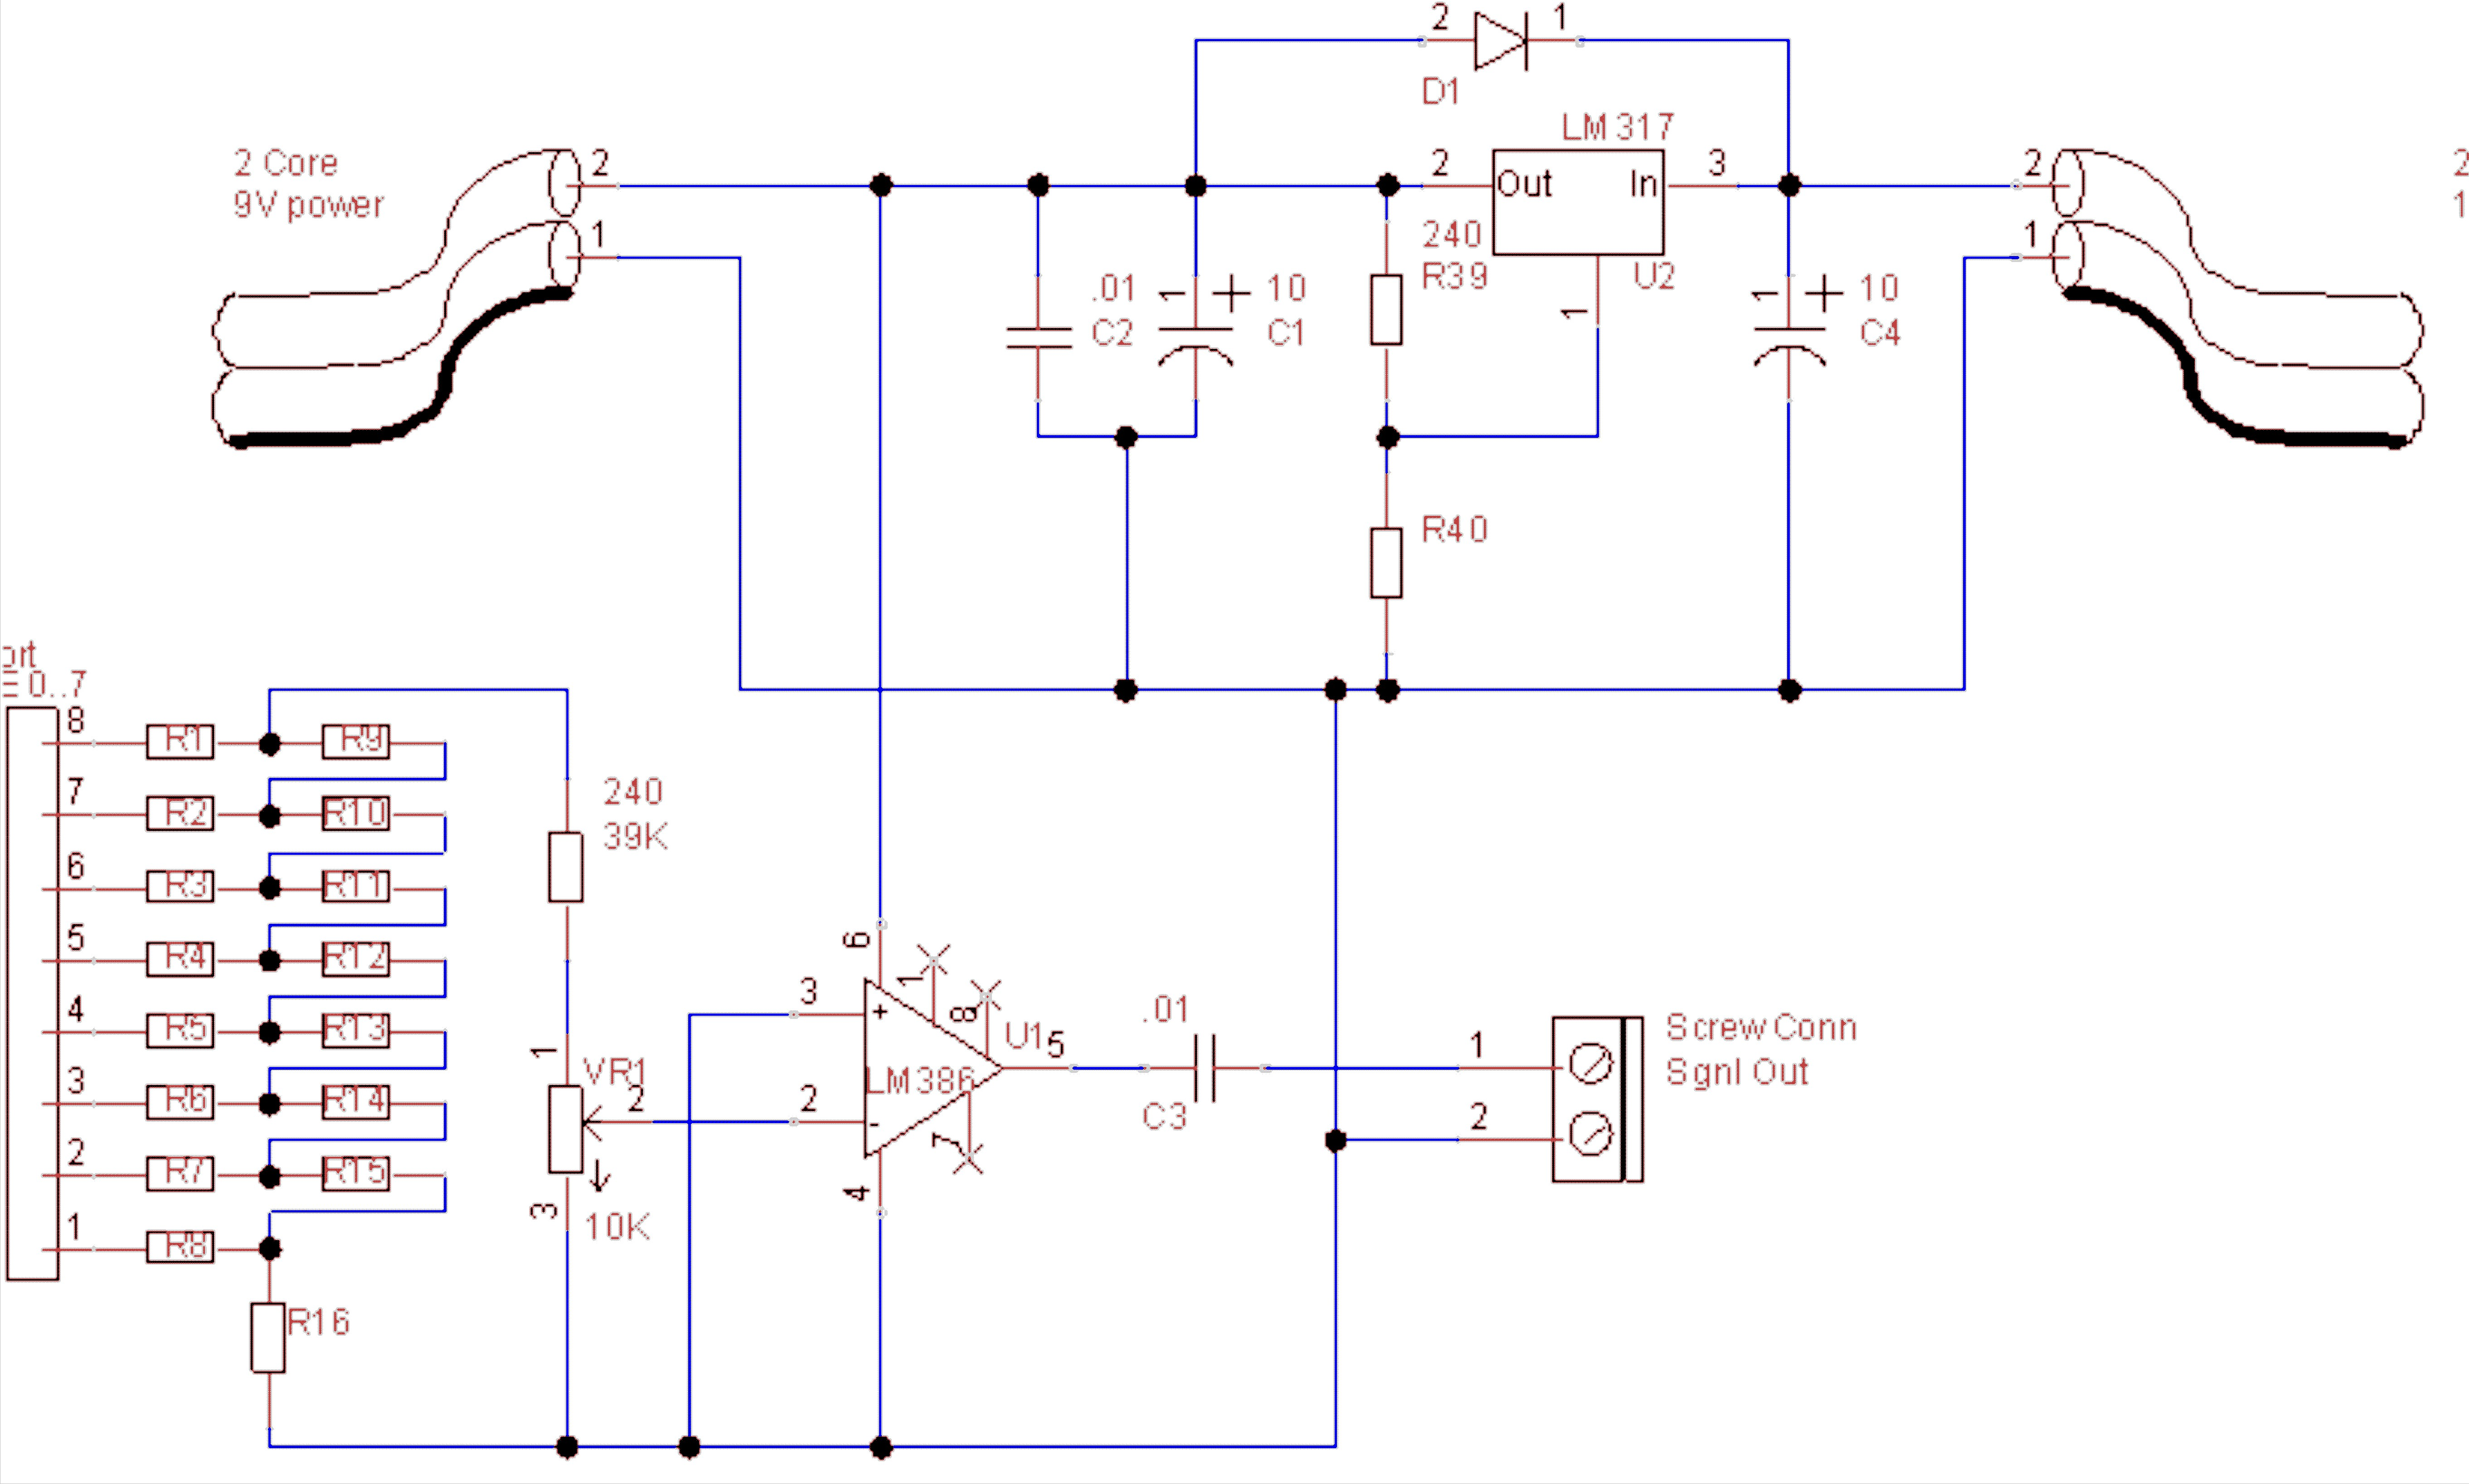 Blog Fiqi: Arduinos AnalogWrite Converting PWM to